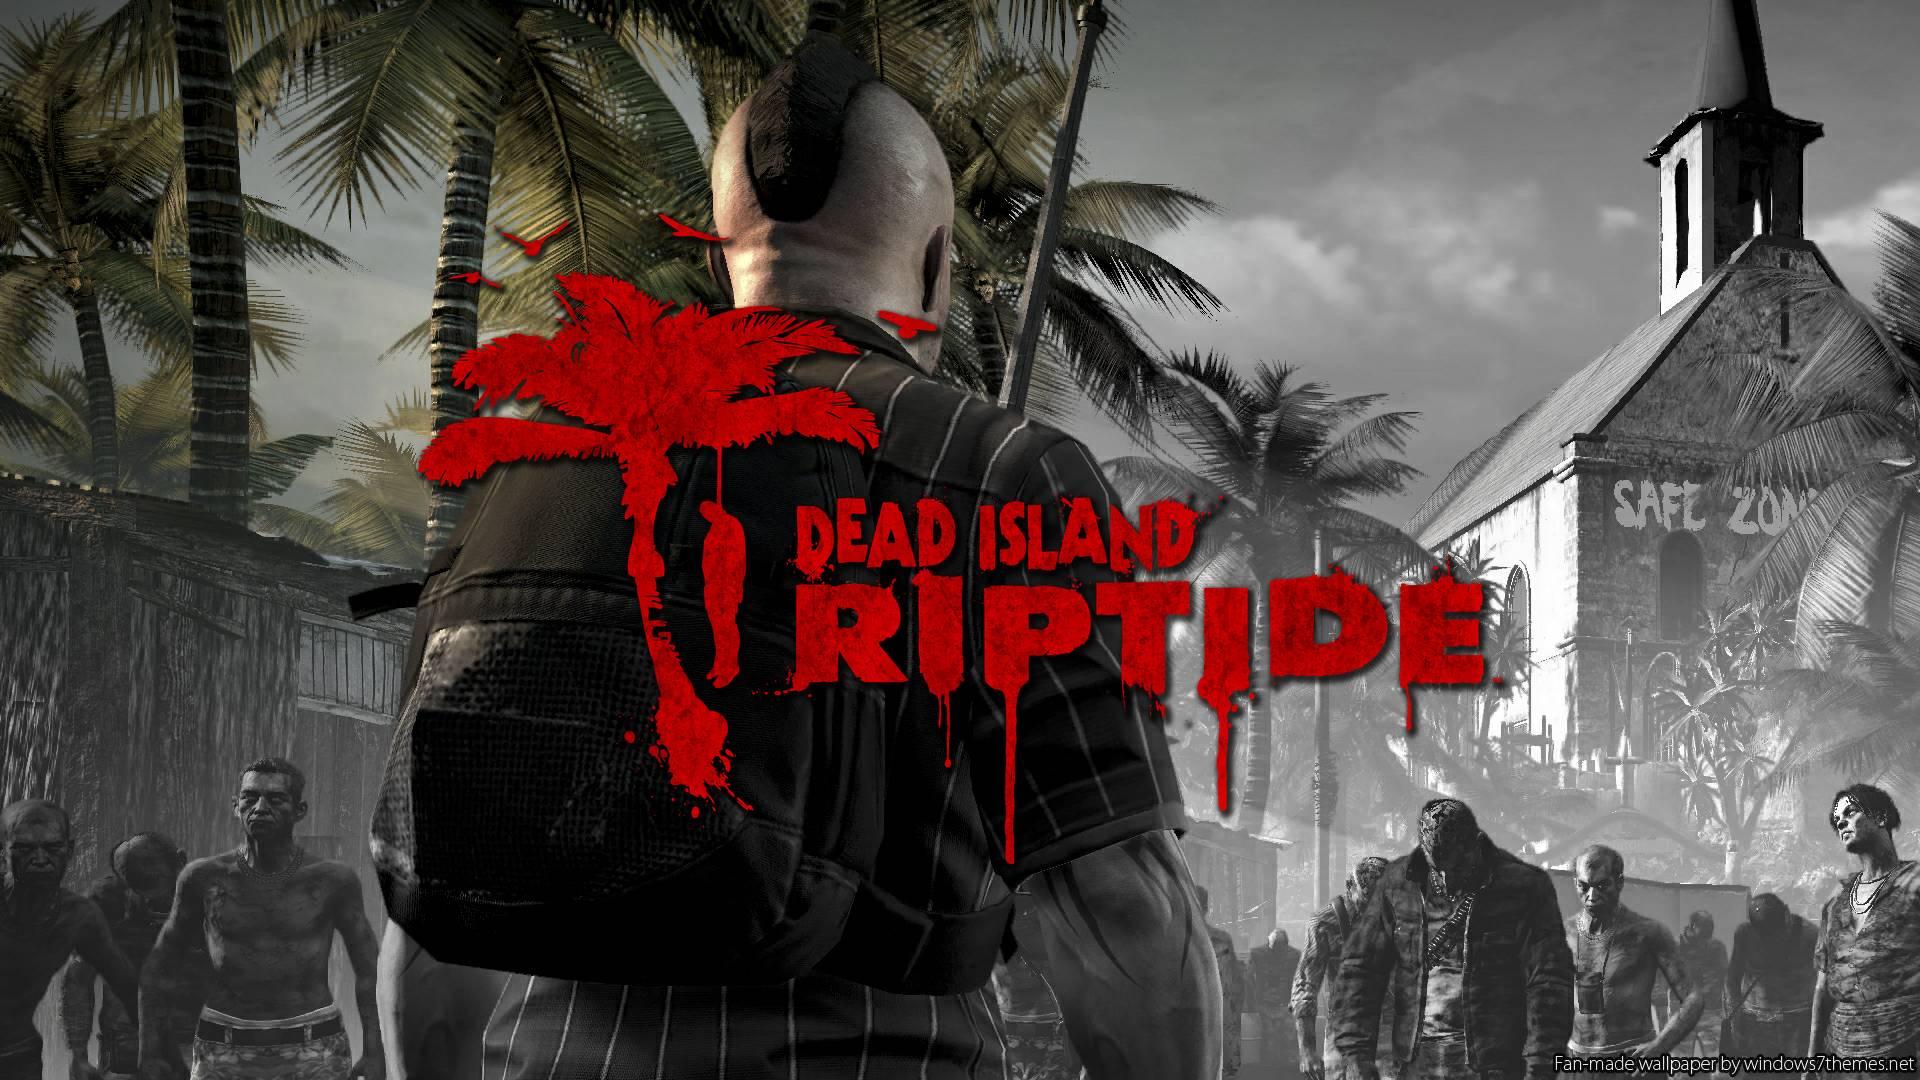 Dead Island Riptide Wallpapers in 1080P HD « GamingBolt ...